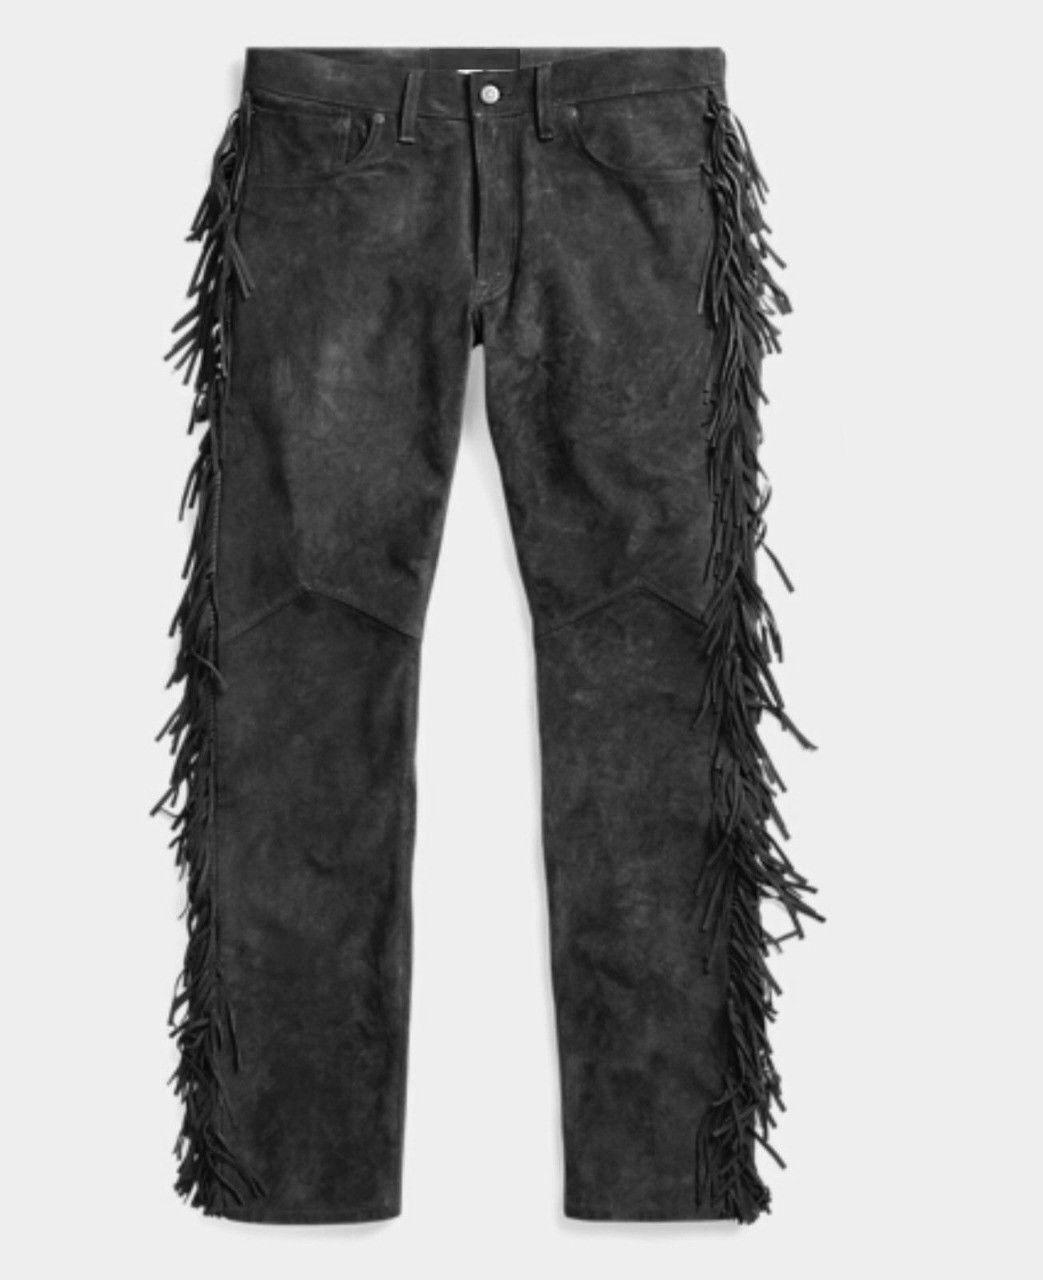 Men's New Native American Buckskin Smoky Goat Suede Leather Fringes Pants WP1B image 3